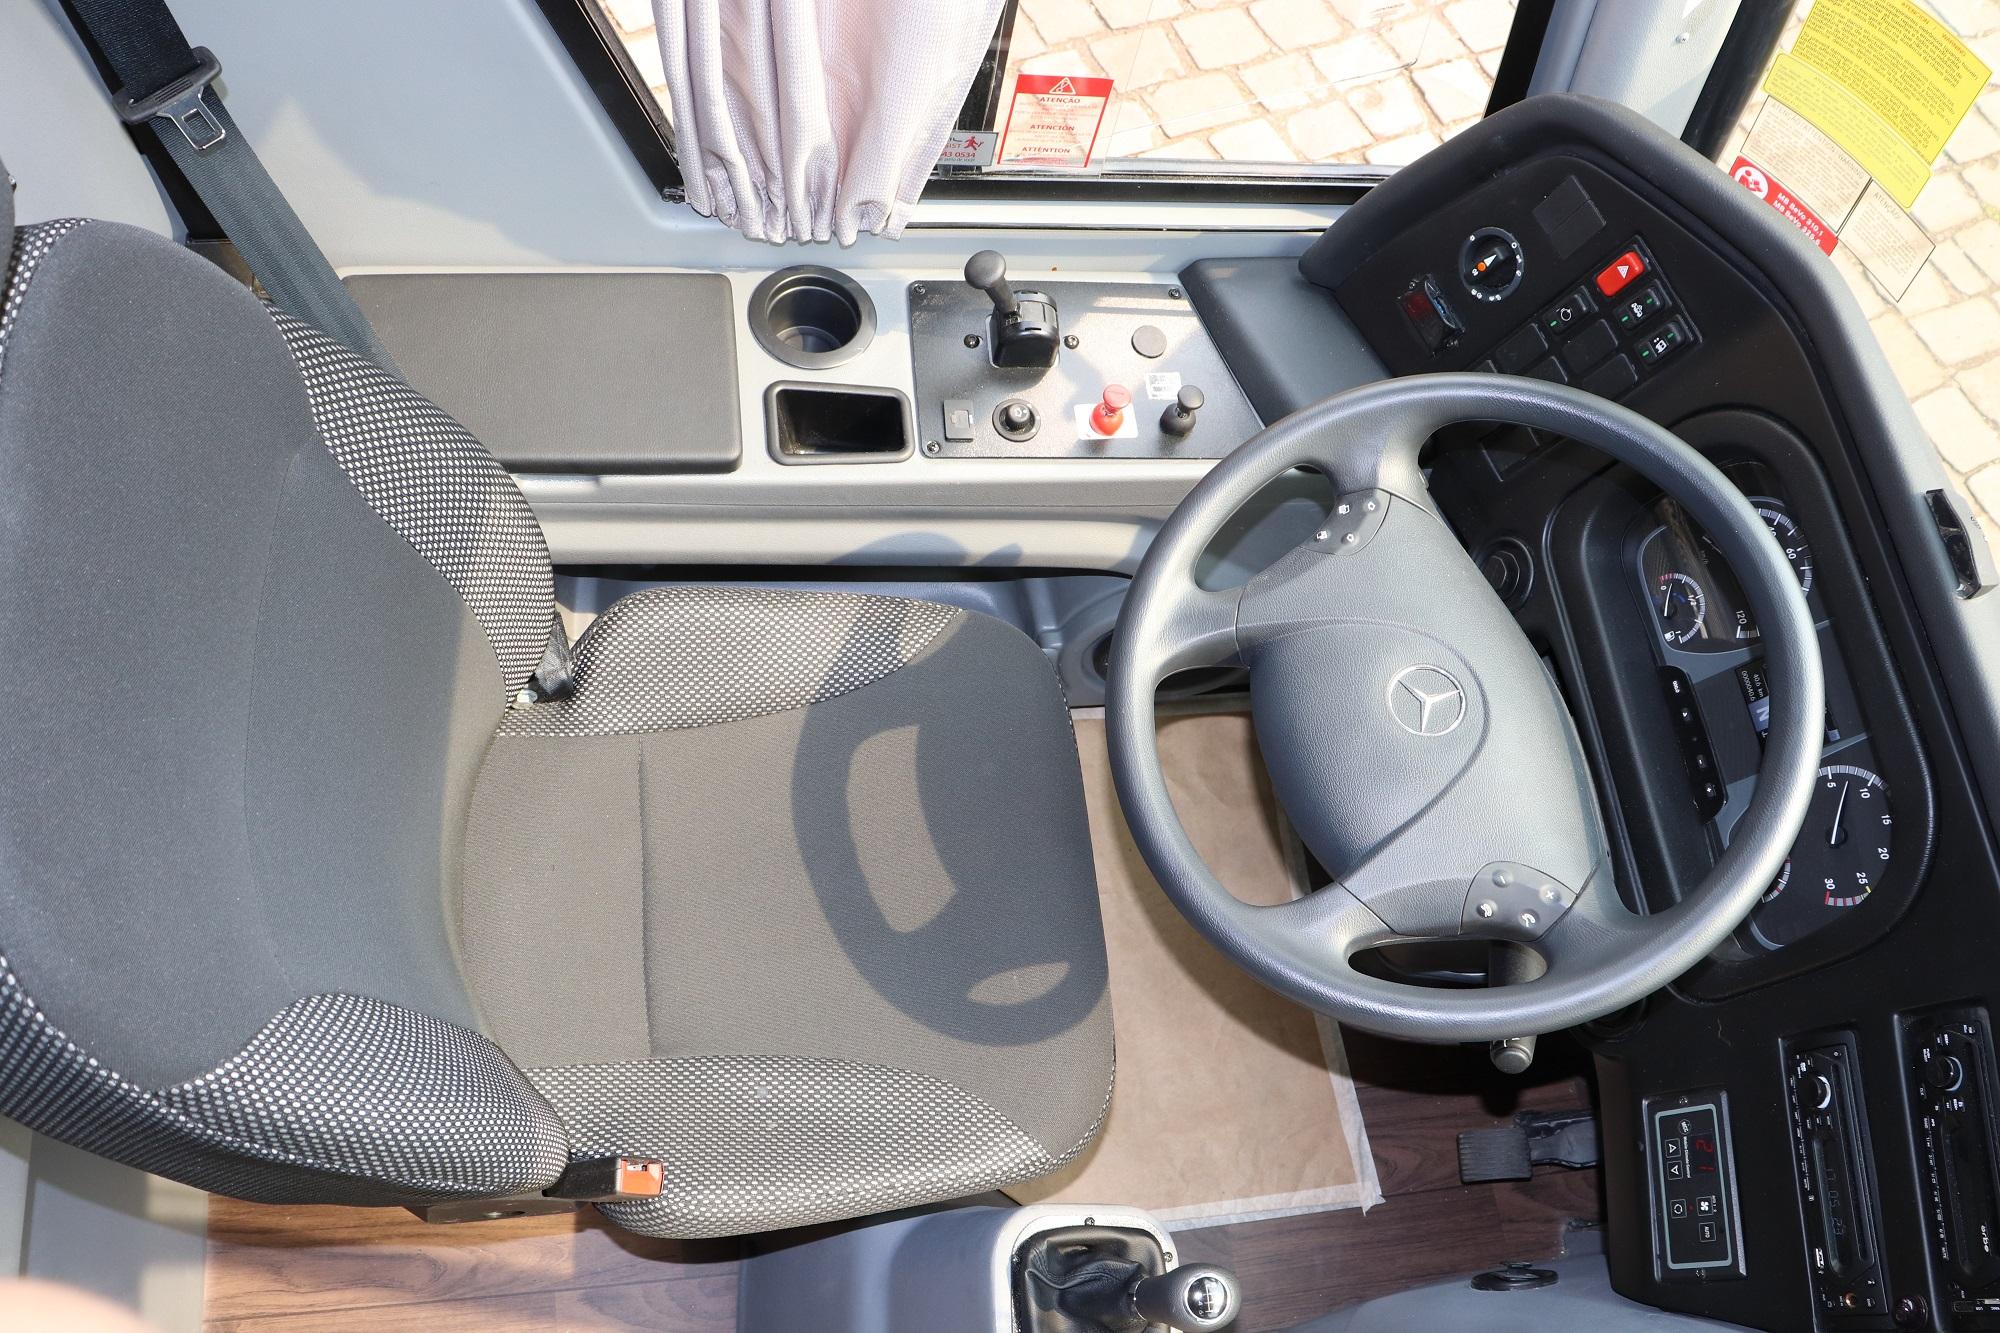 Mercedes-Benz Comil Campione Invictus 1200 unveiled! - Brand Spur